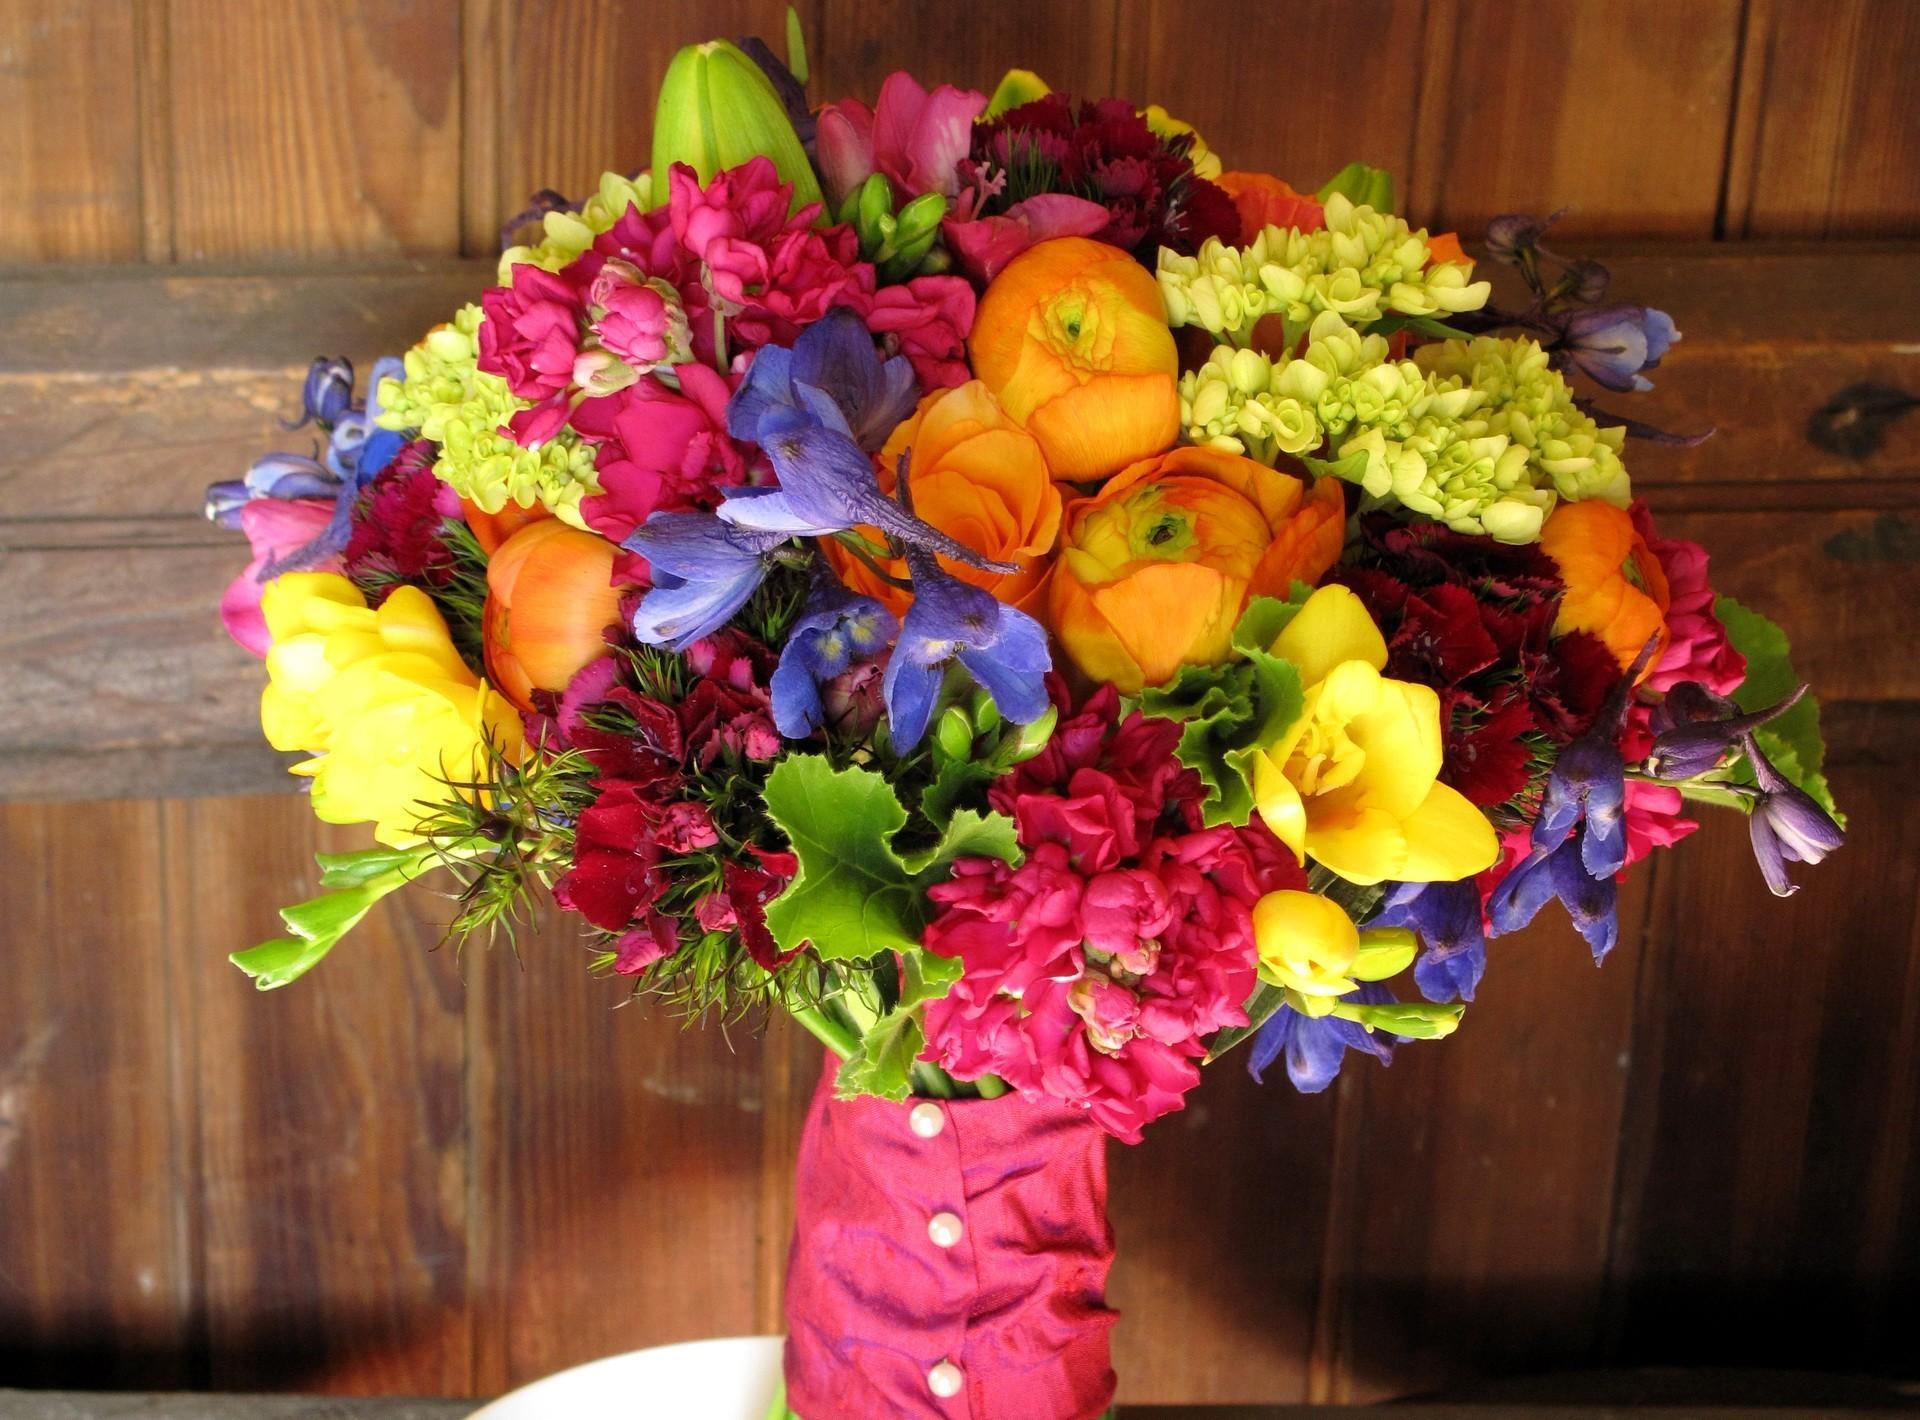 Wallpaper : yellow, bright, beautiful, plant, flora, petal, retail ...